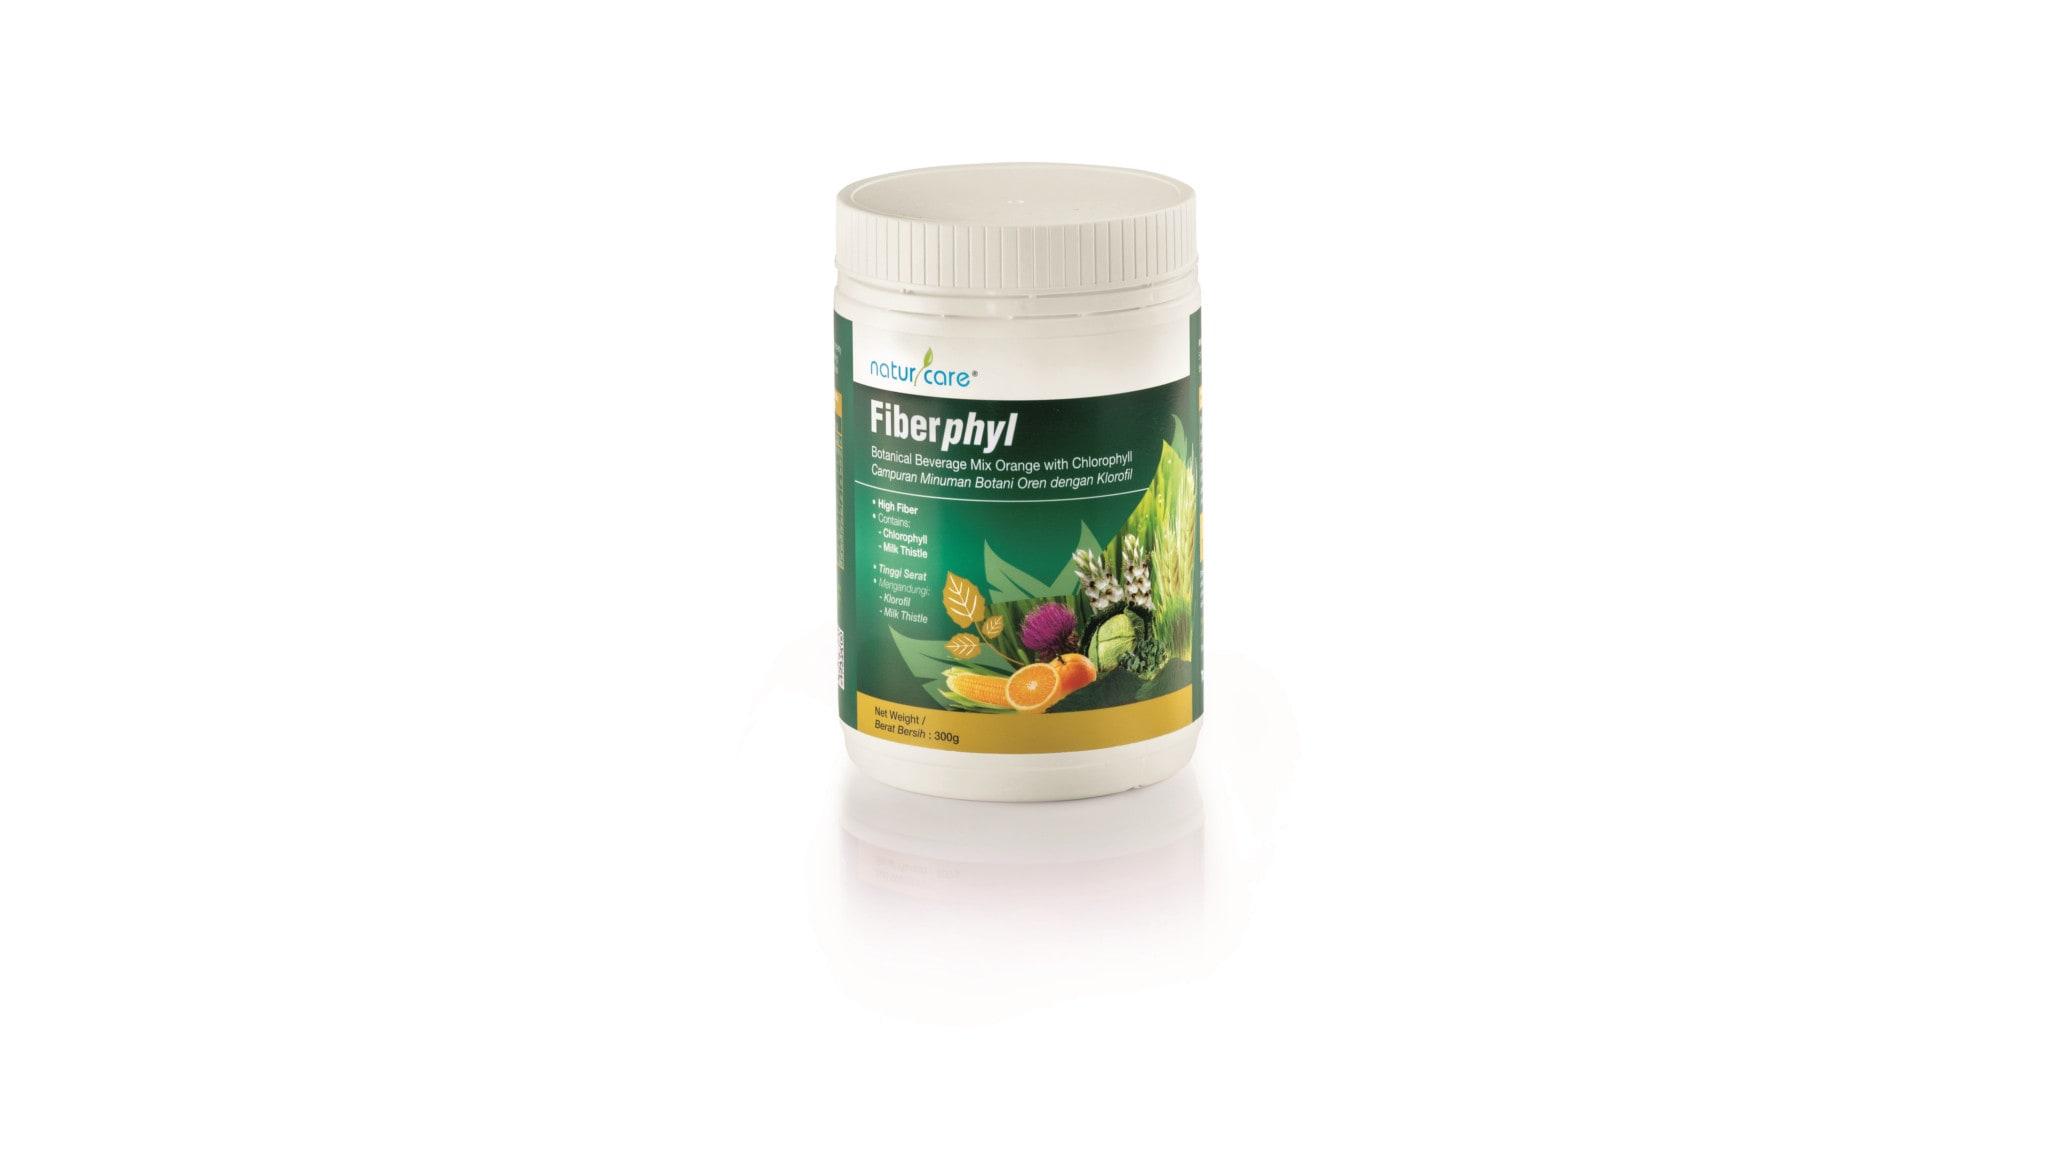 NaturCare® Fiberphyl (1) 300g